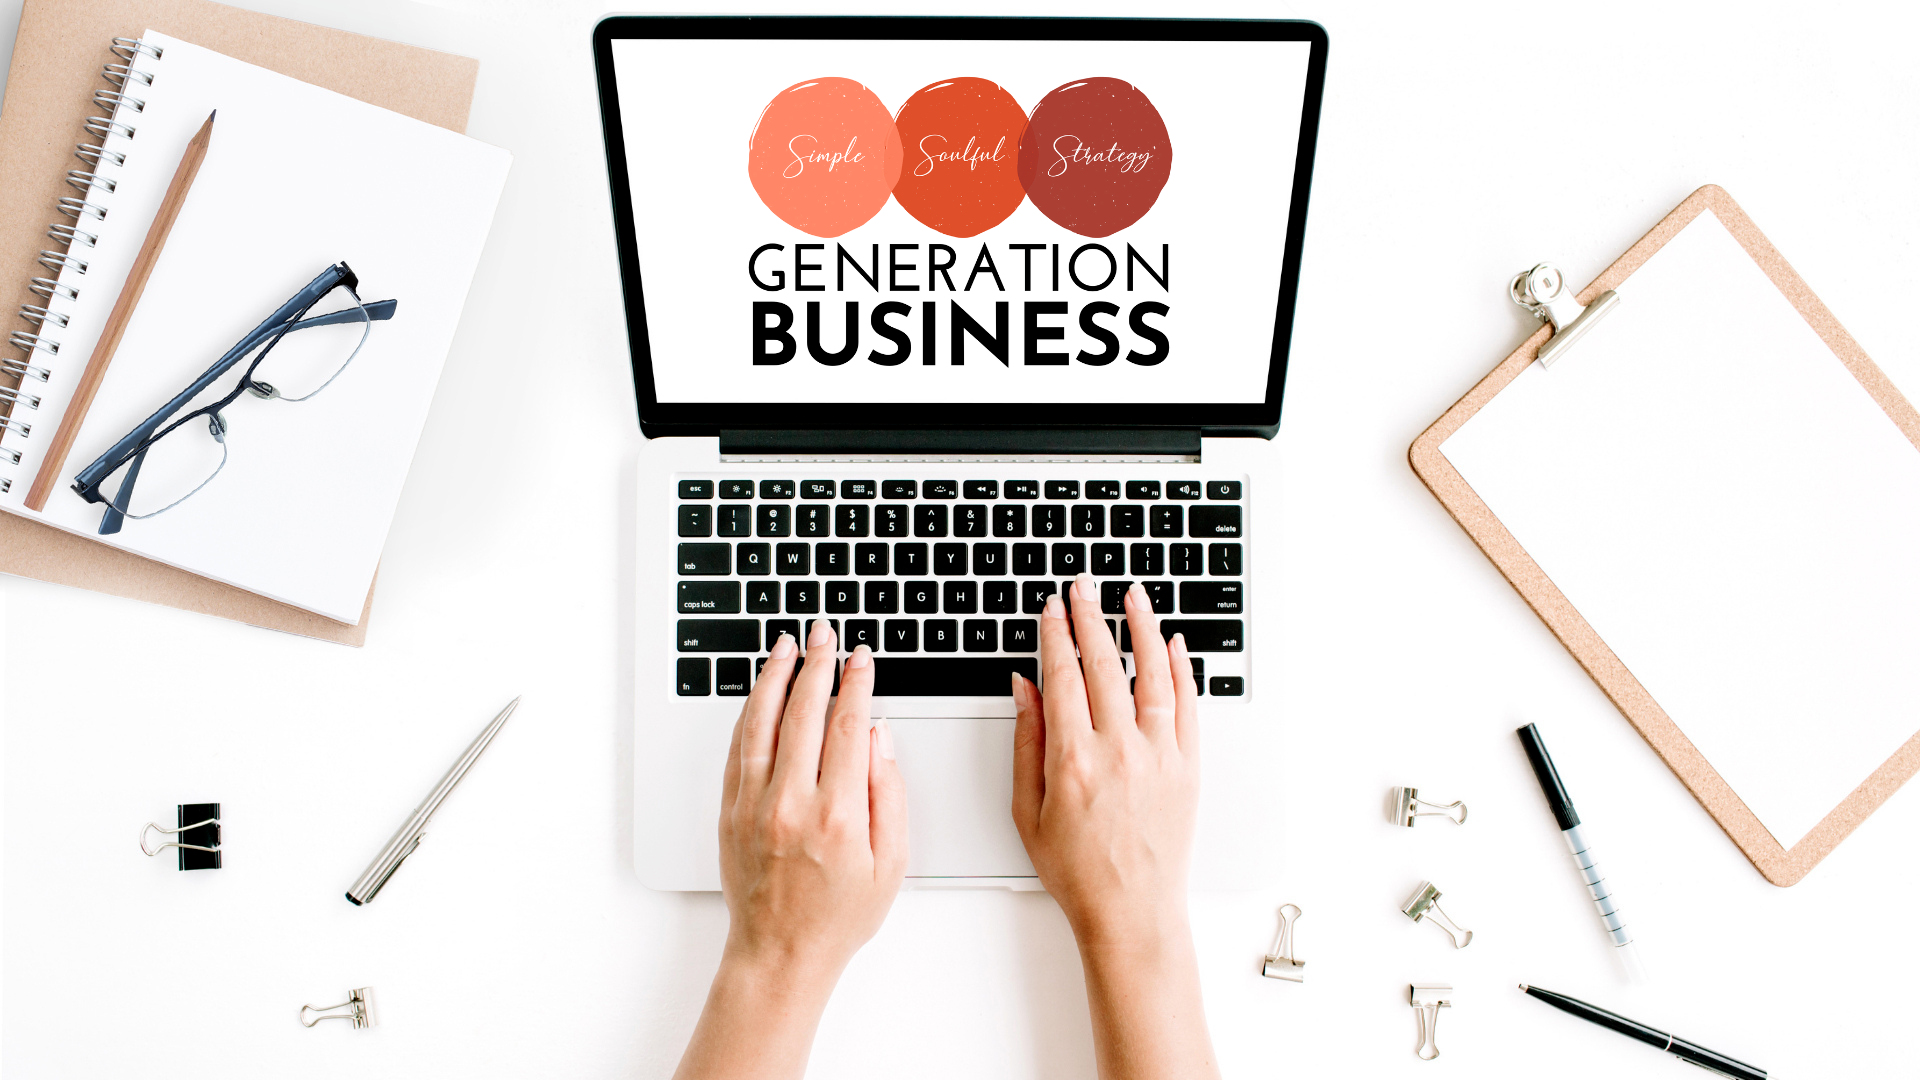 Generation Business